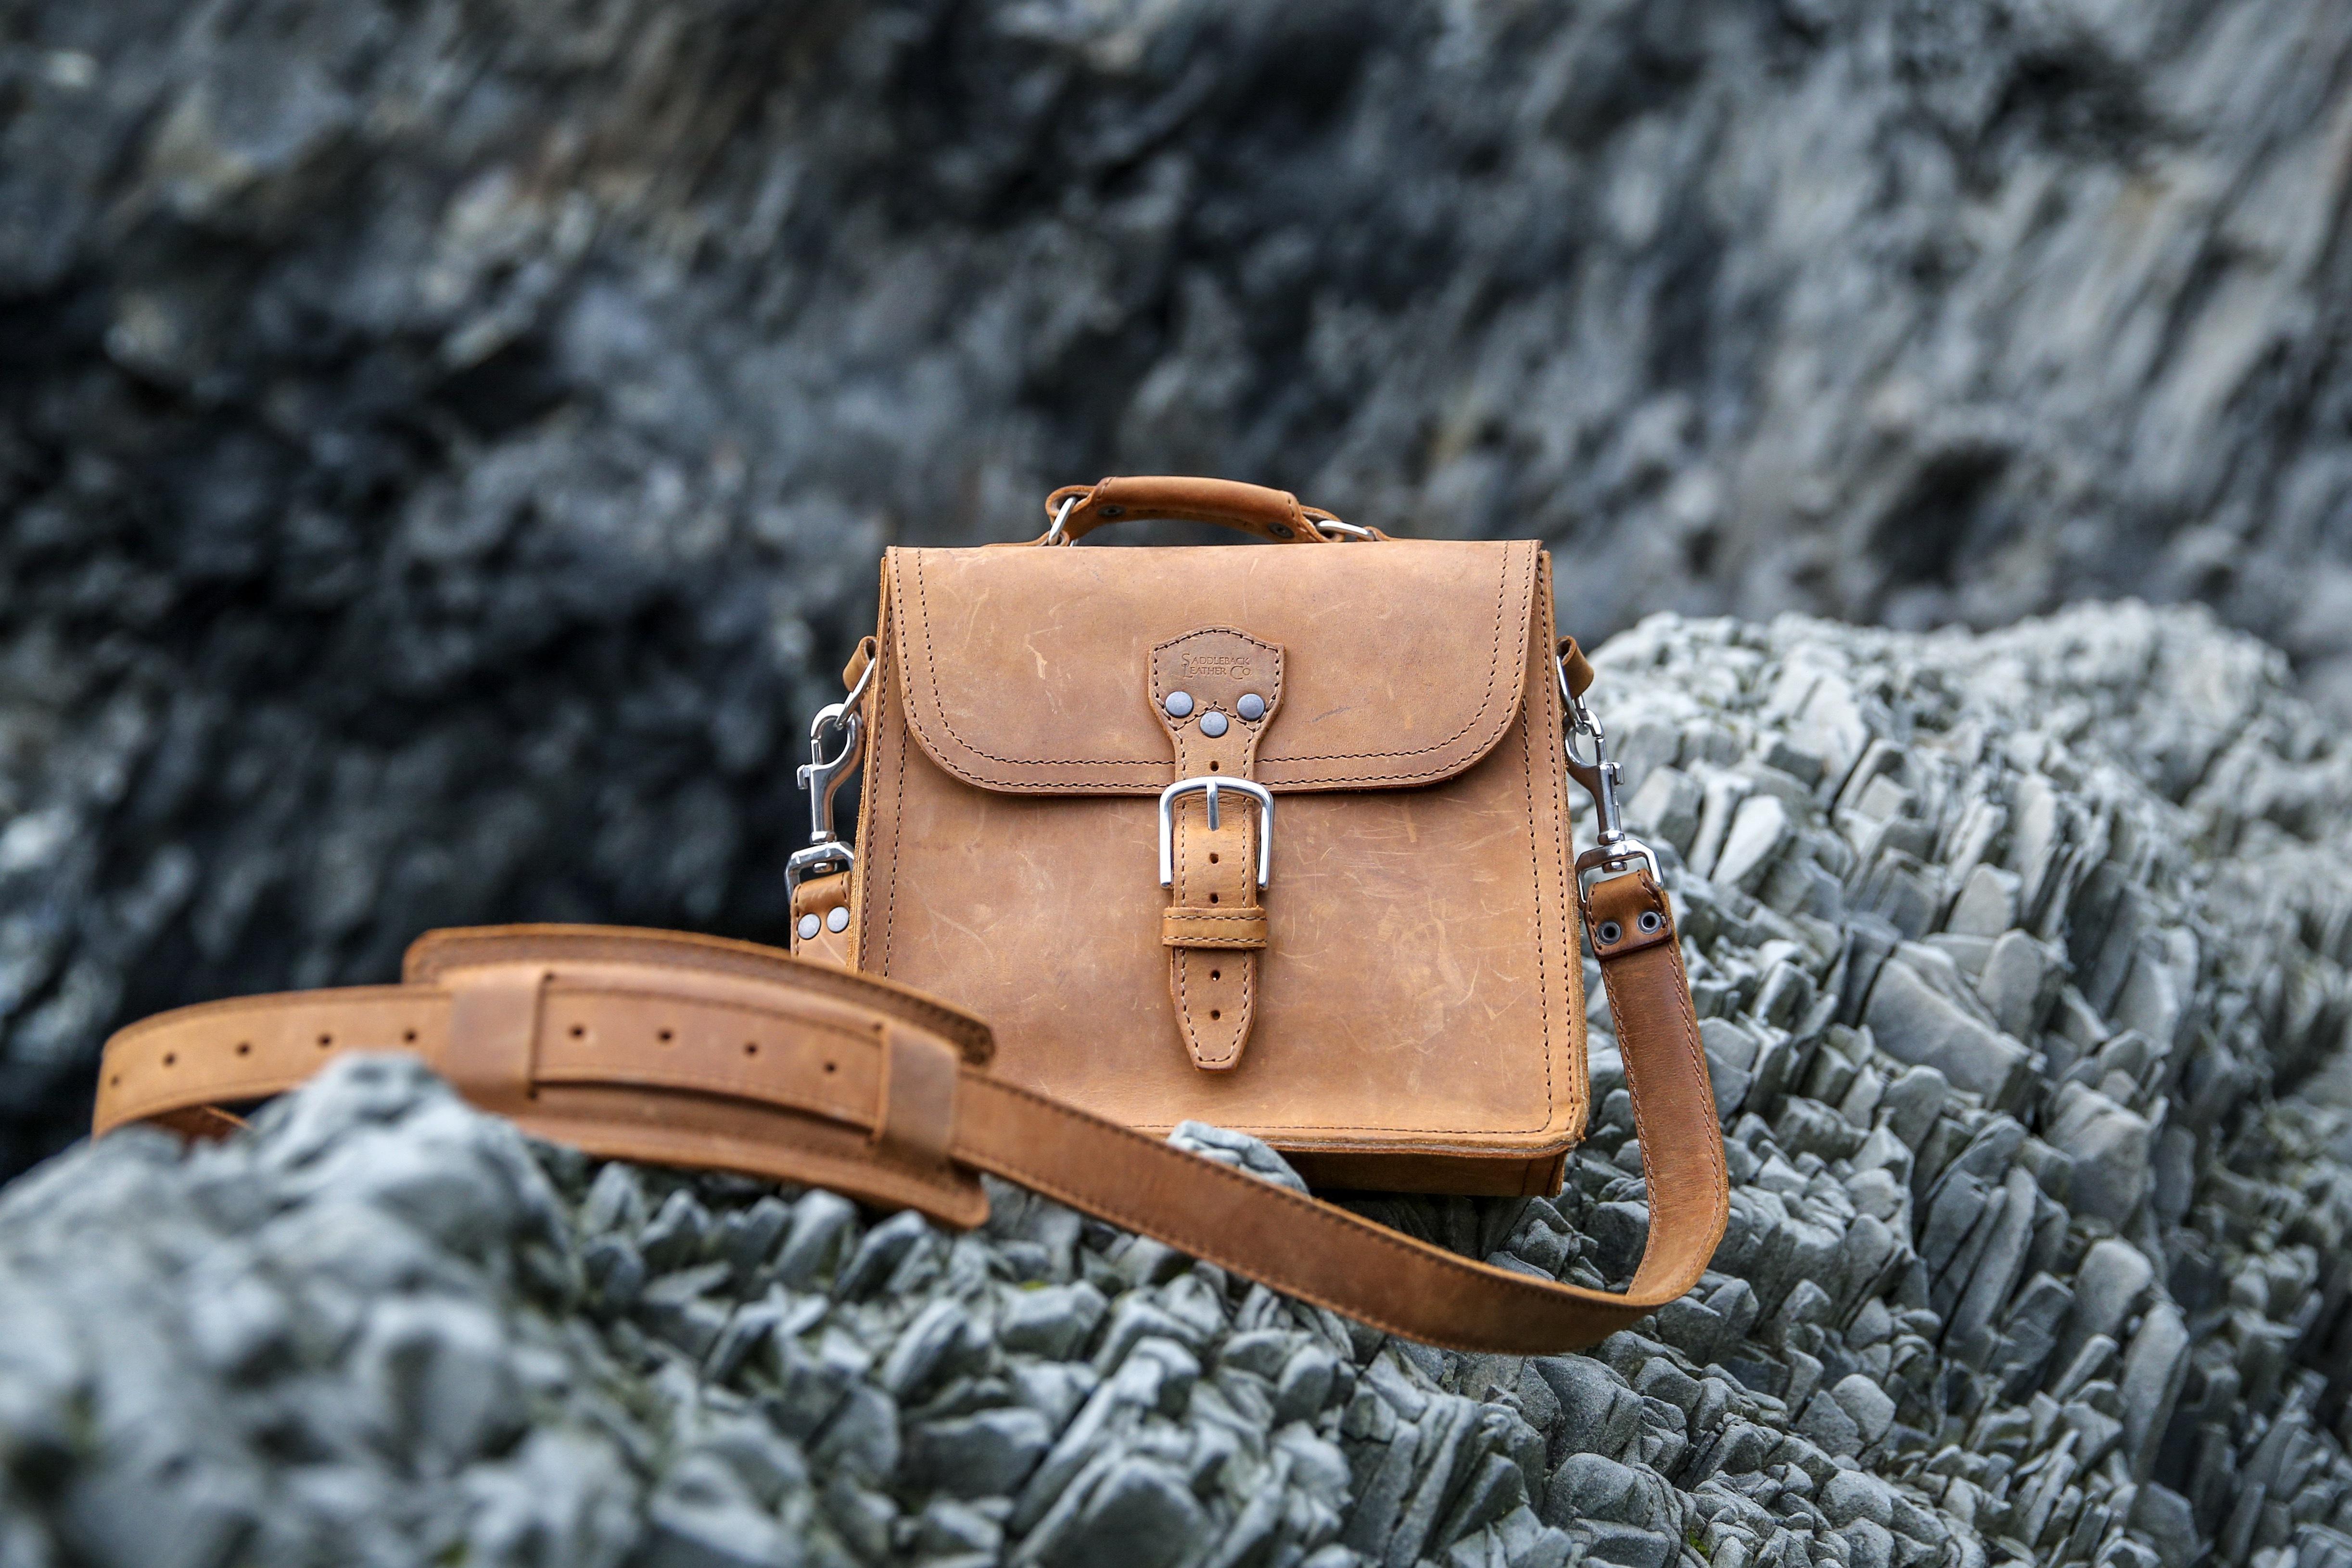 leather satchel man bag Indiana Jones